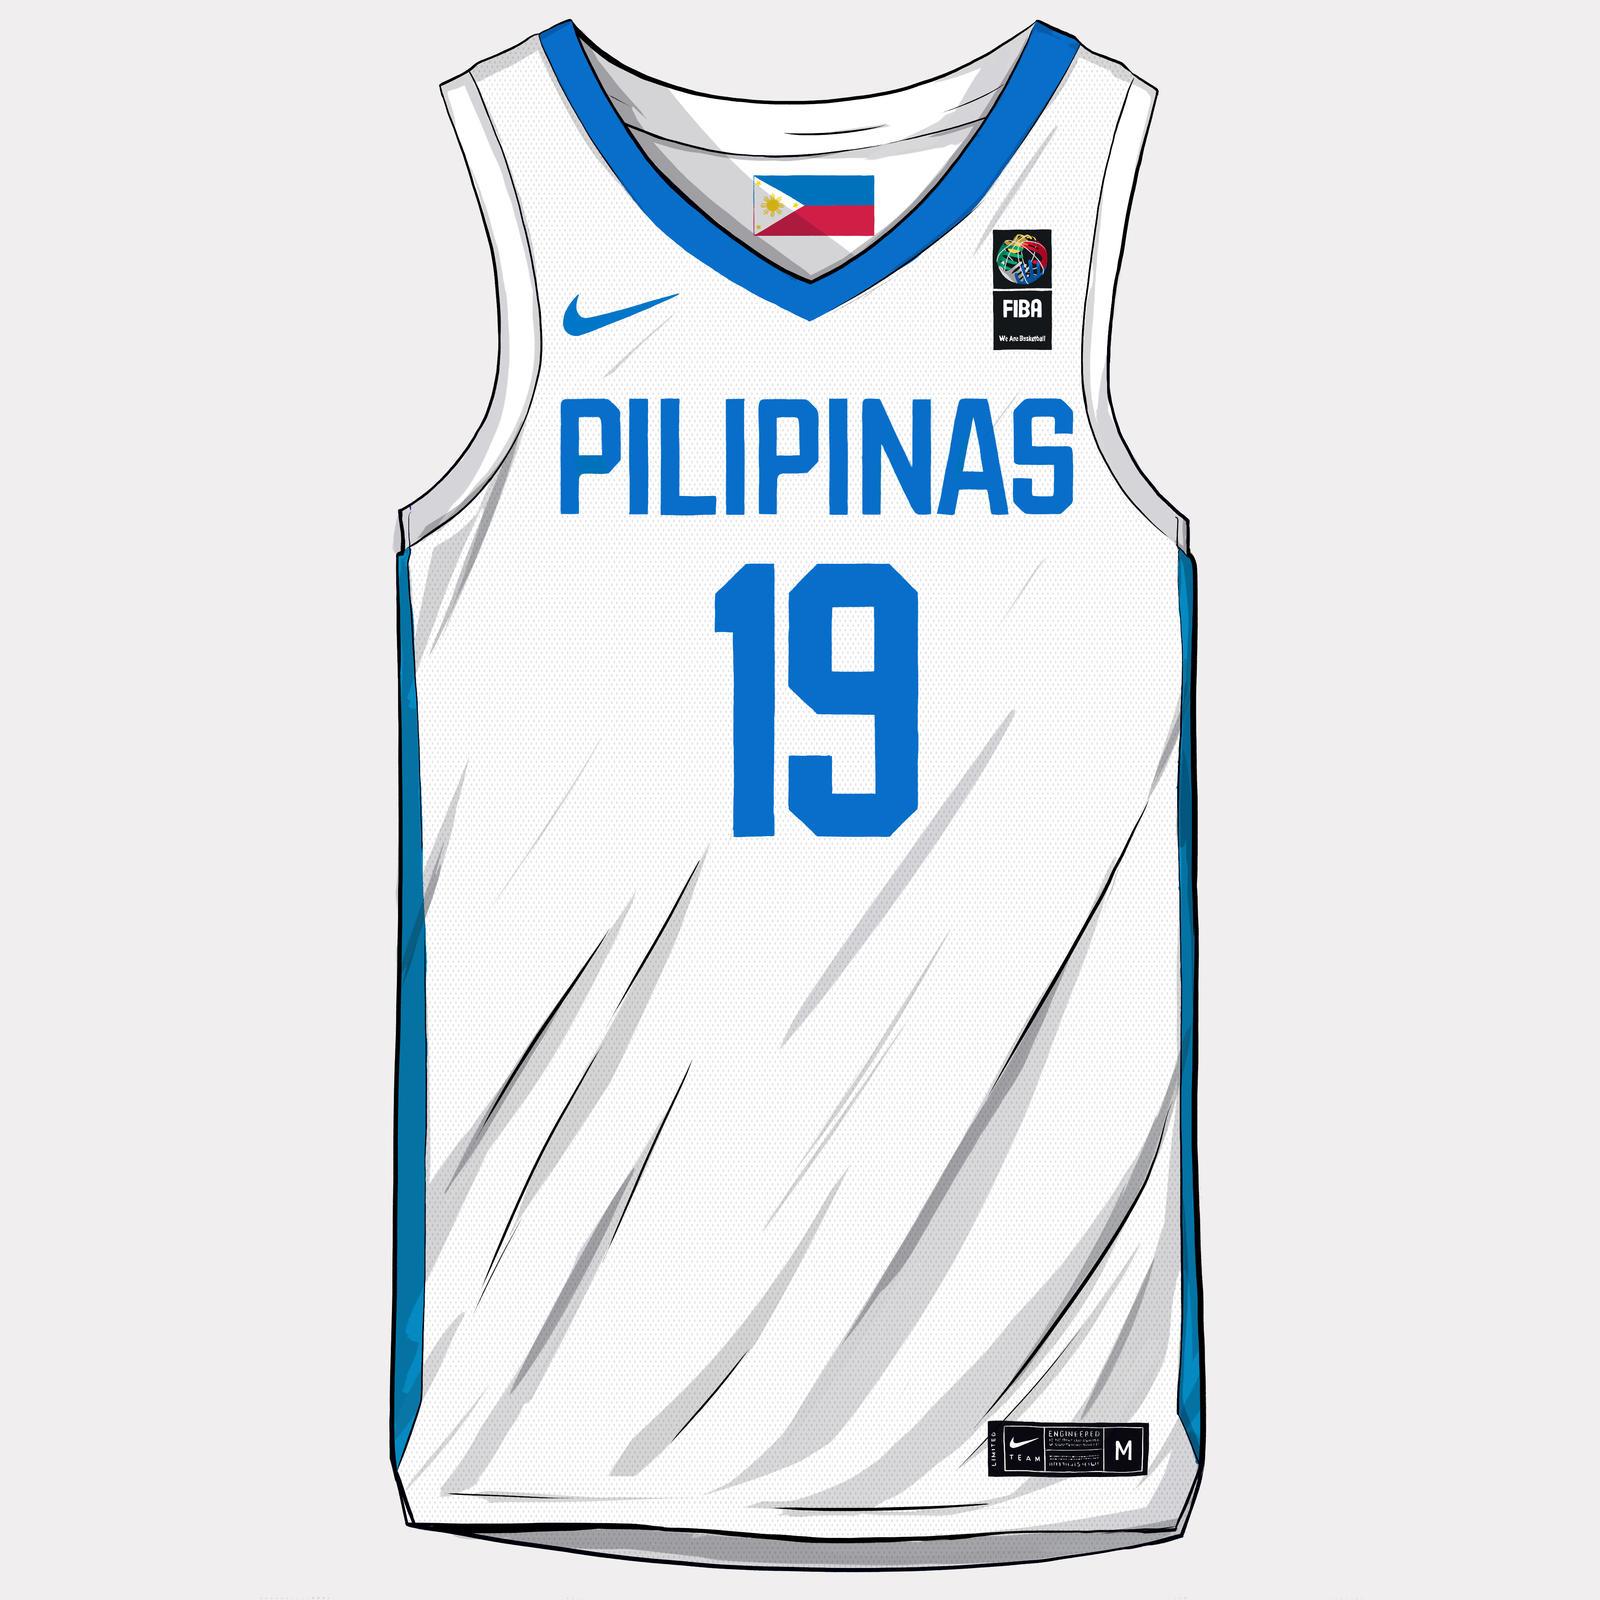 nike-news-philippines-national-team-kit-2019-illustration-1x1_2_89535.jpg